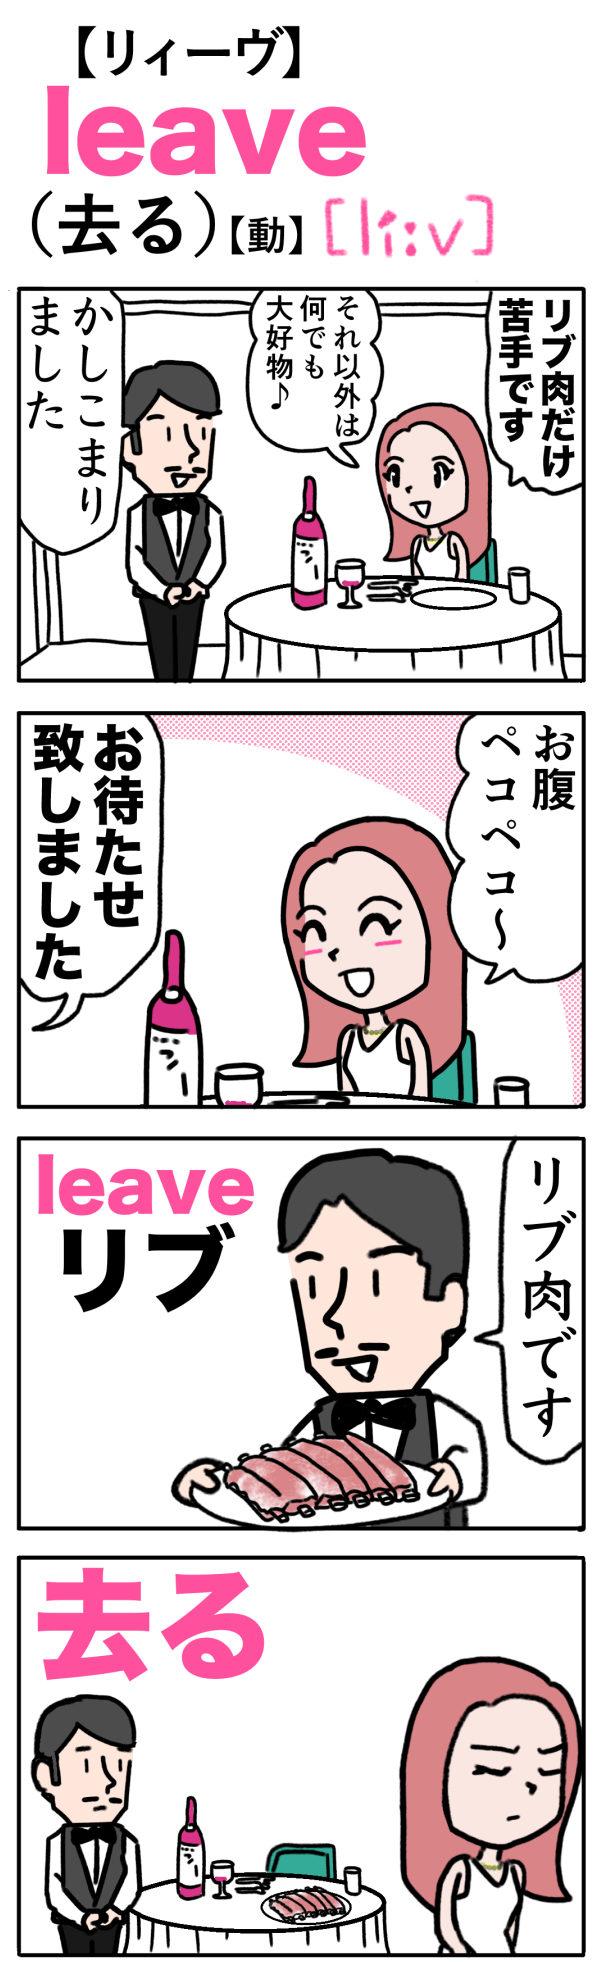 leave(去る)の語呂合わせ英単語